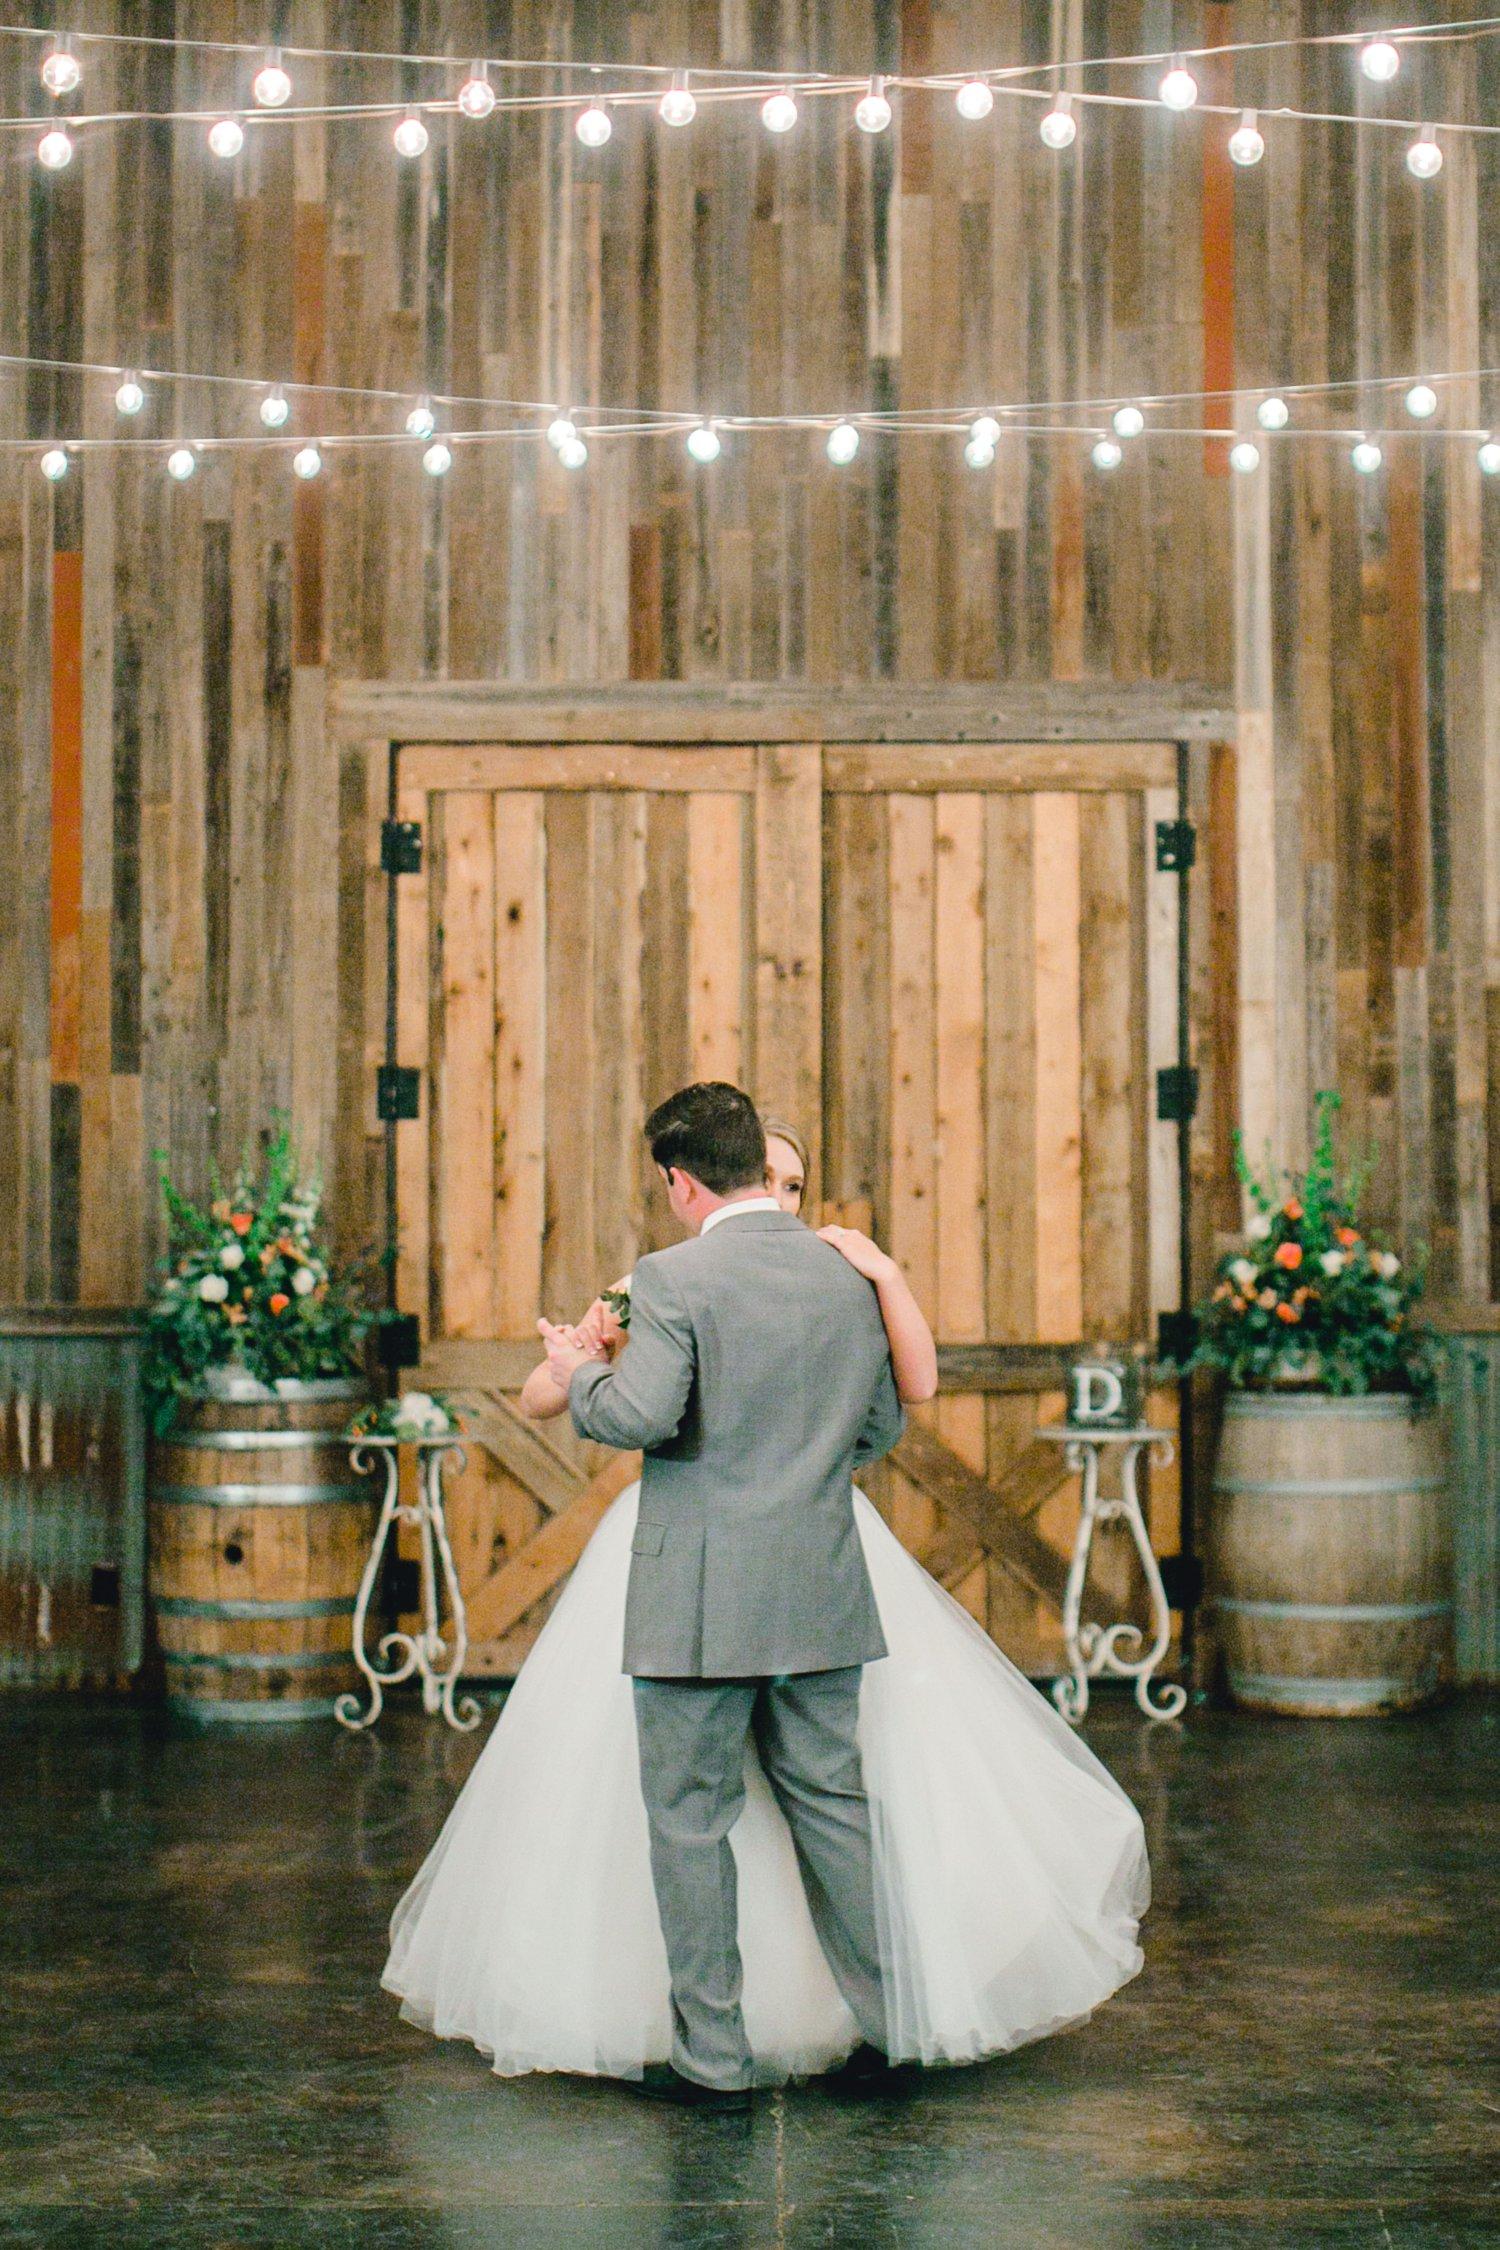 kayla-jacob-dow-cotton-creek-barn-lubbock-wedding-photographer-alleej0137.jpg